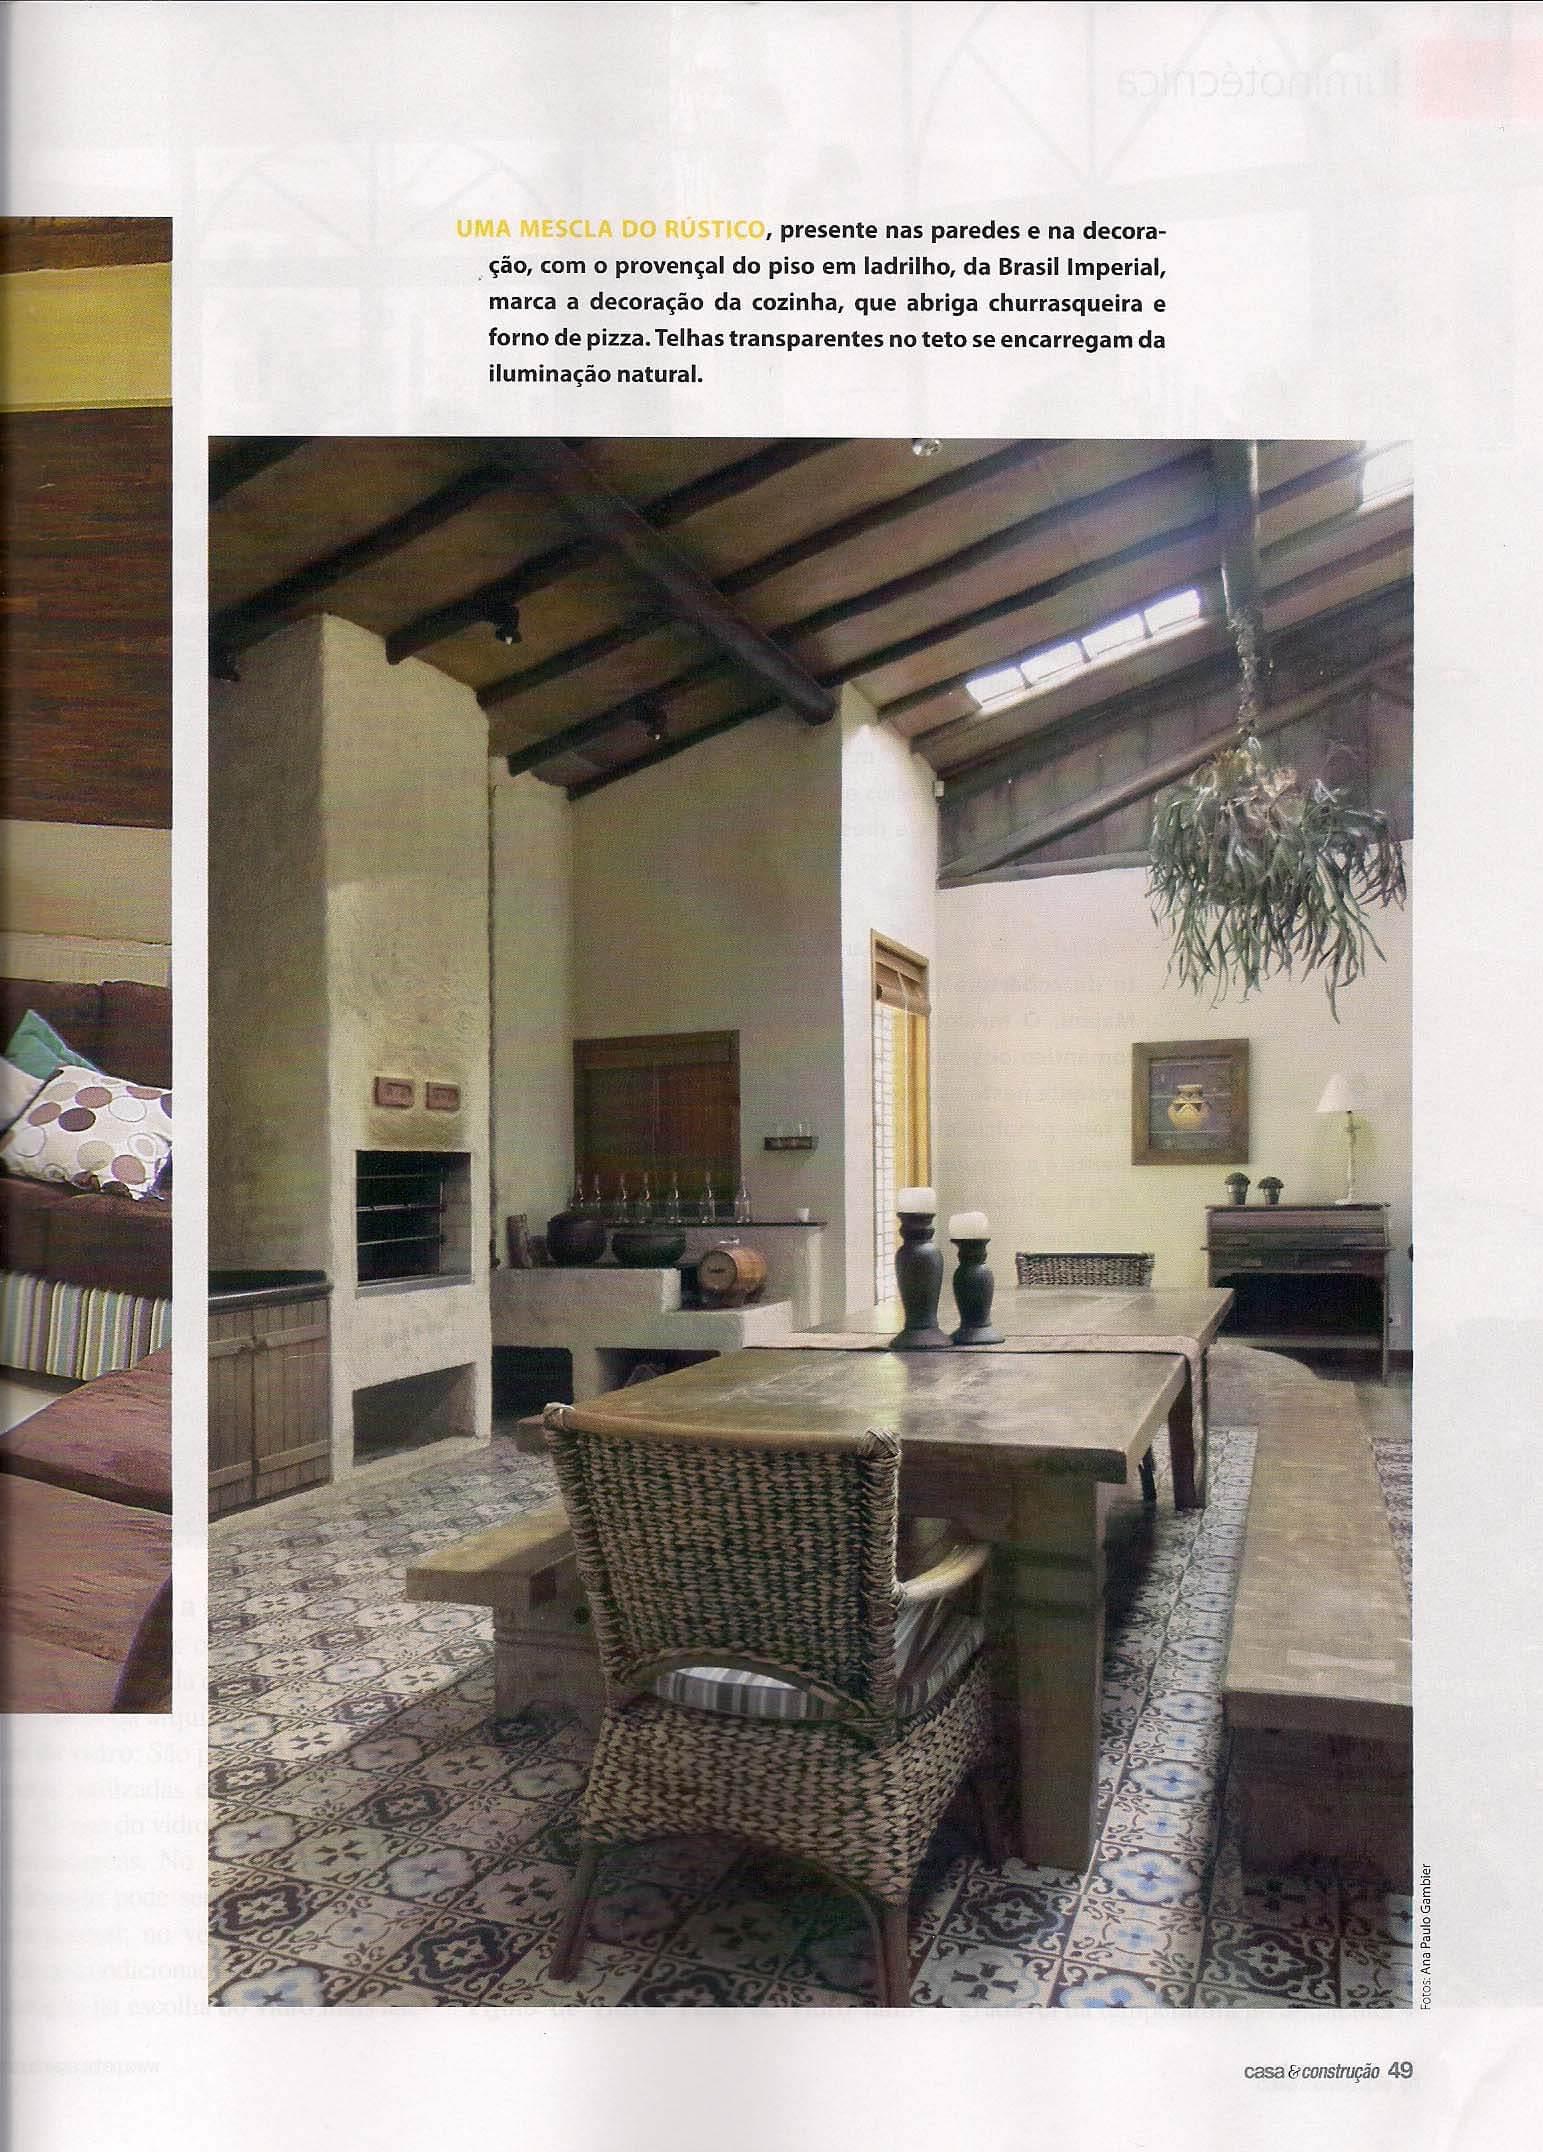 Casa & Construcao  - jan 2012 - 3